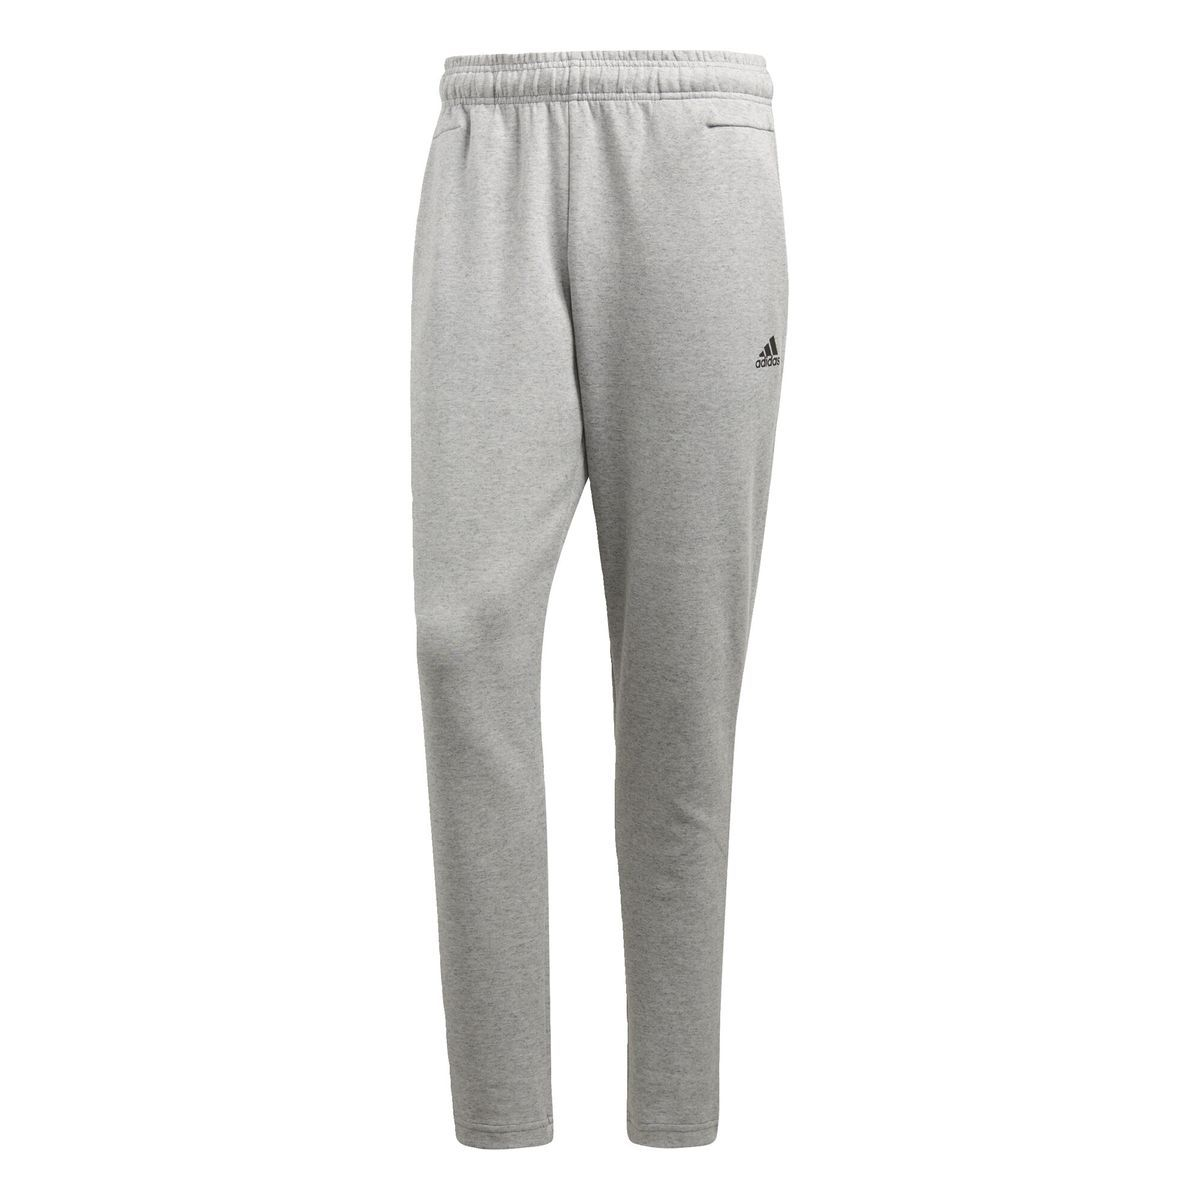 jogging hommes adidas chaud